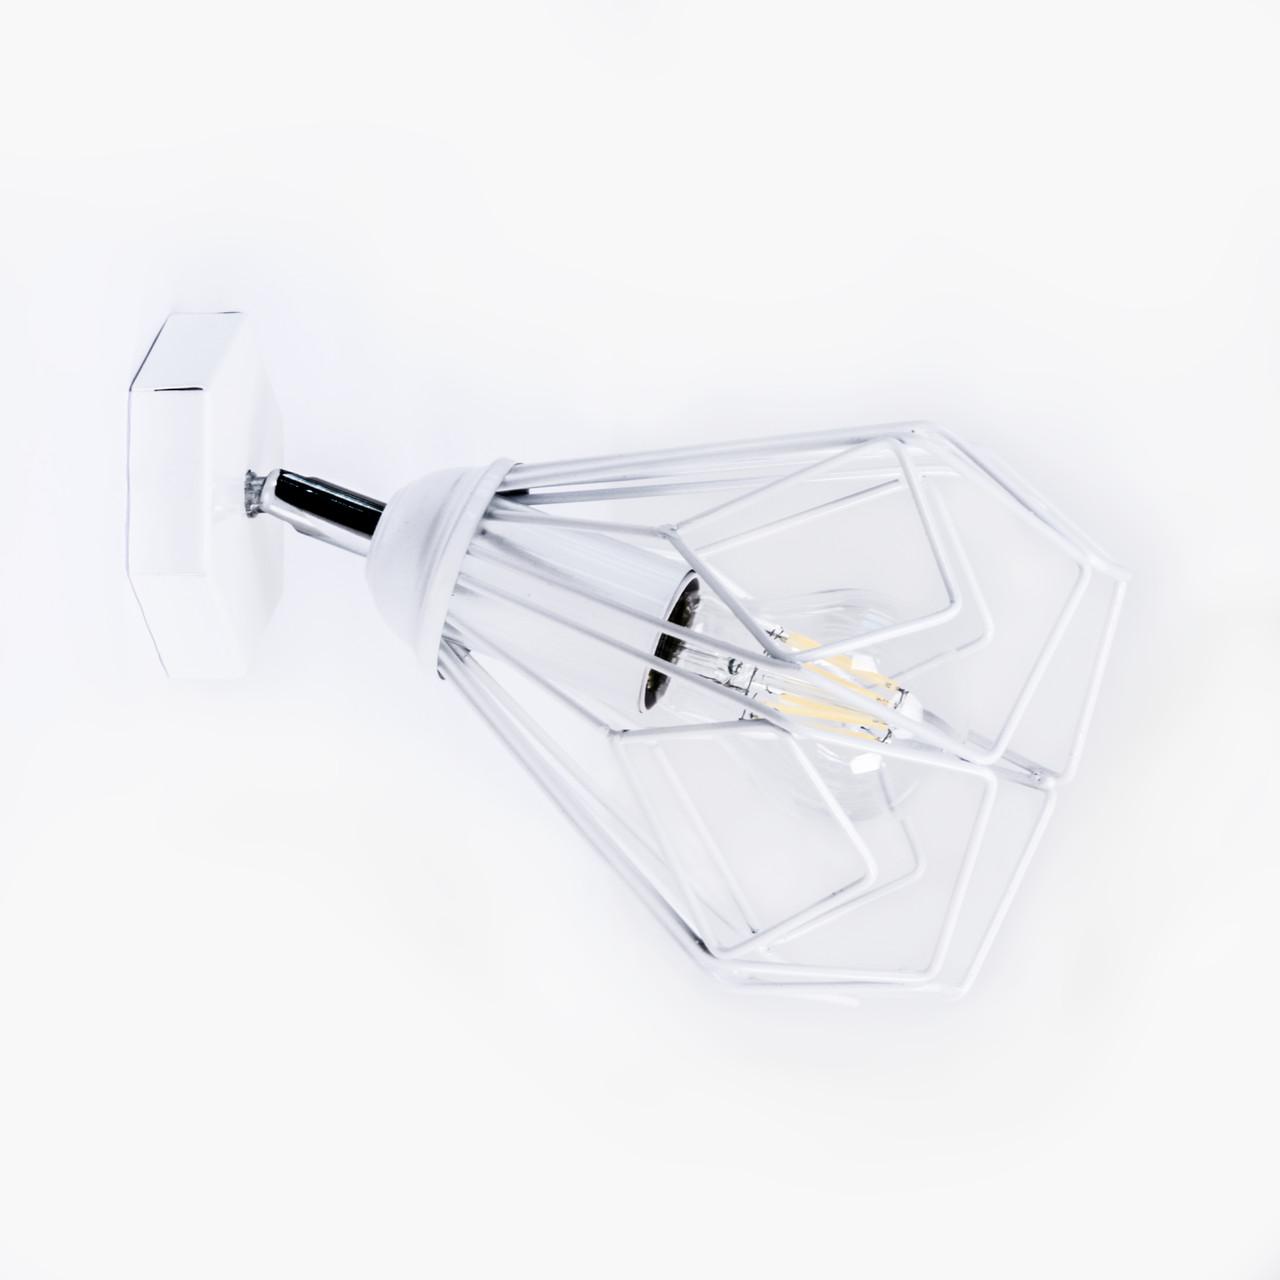 Бра Atma Light серії Bevel W165 White